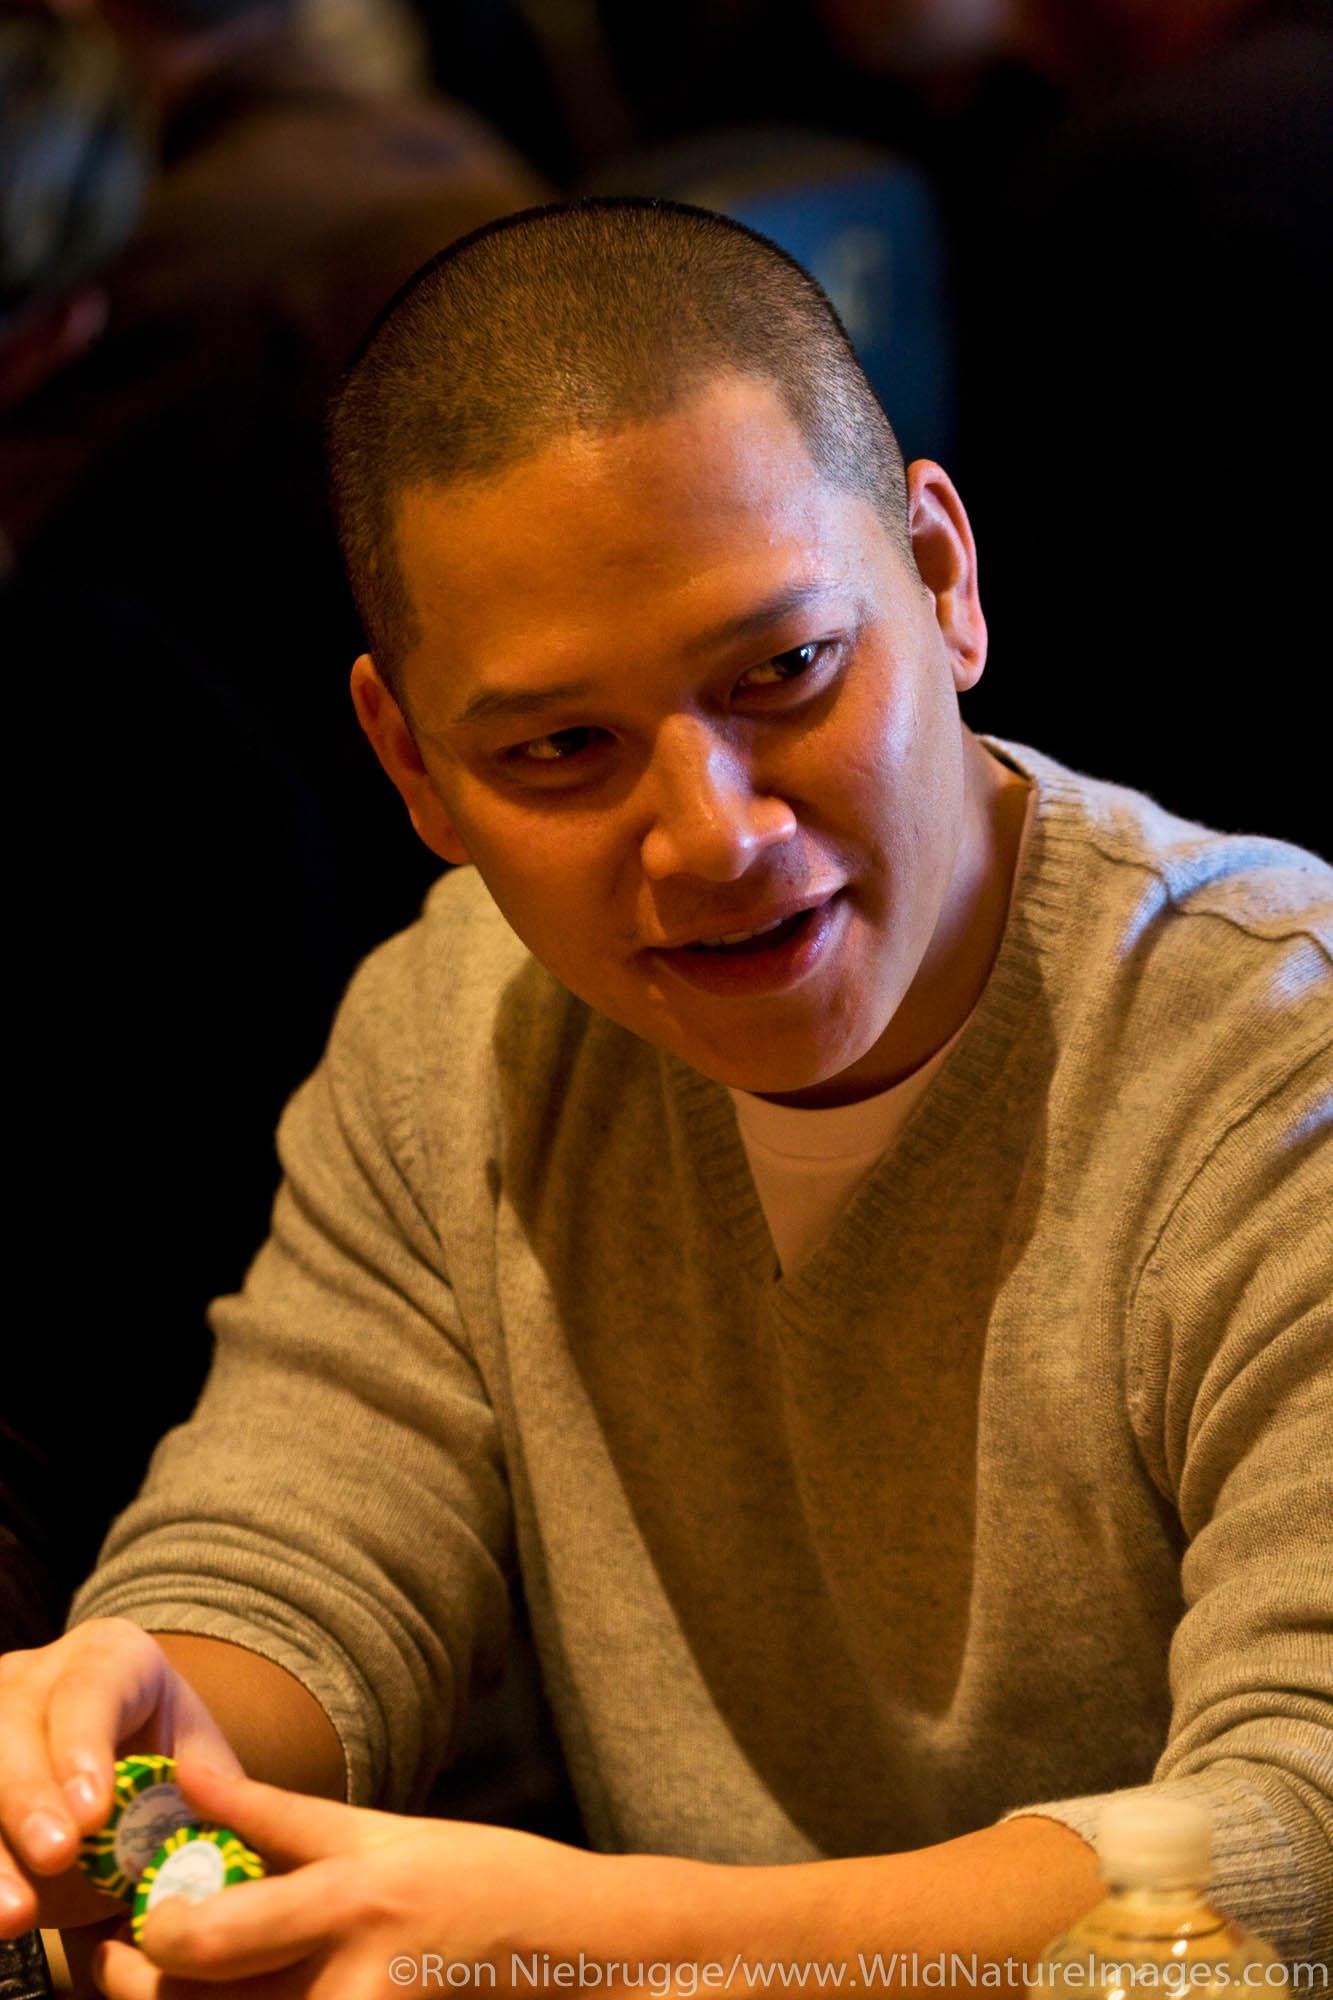 Tuan Le at the 2008 World Poker Tour Festa Al Lago poker tournament at the Bellagio Resort and Casino, Las Vegas, Nevada.